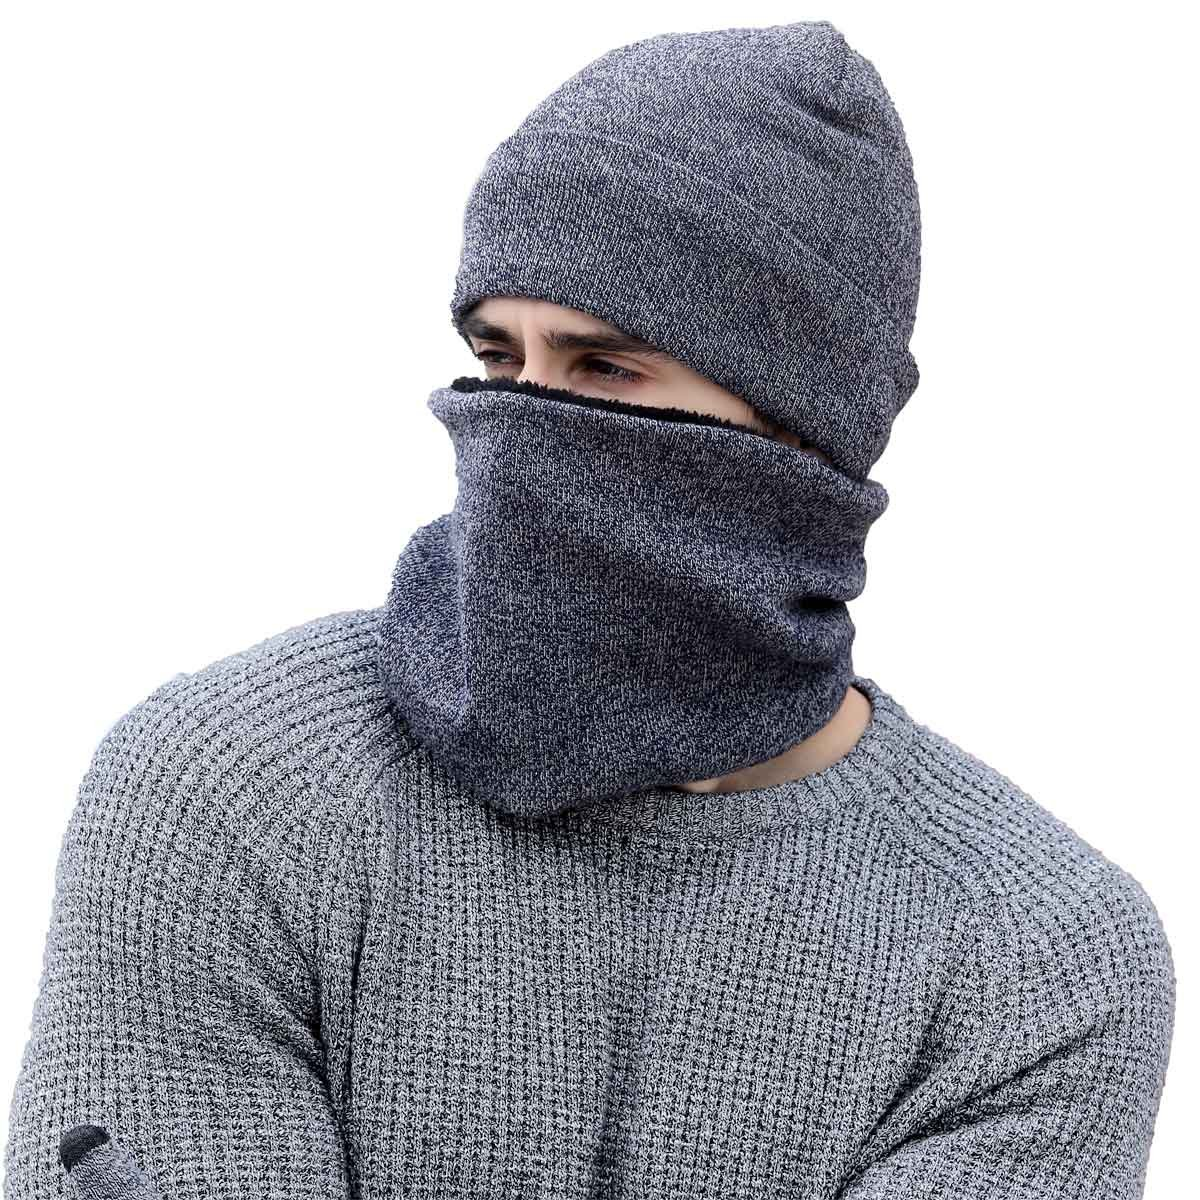 1b5a992206e0 heekpek Bufanda Gorro Guantes para Hombre Invierno Regalos para Hombre  Mujer Unisexo Set de Bufanda Conjunto de Guantes de Punto BufaSombrero de  ...